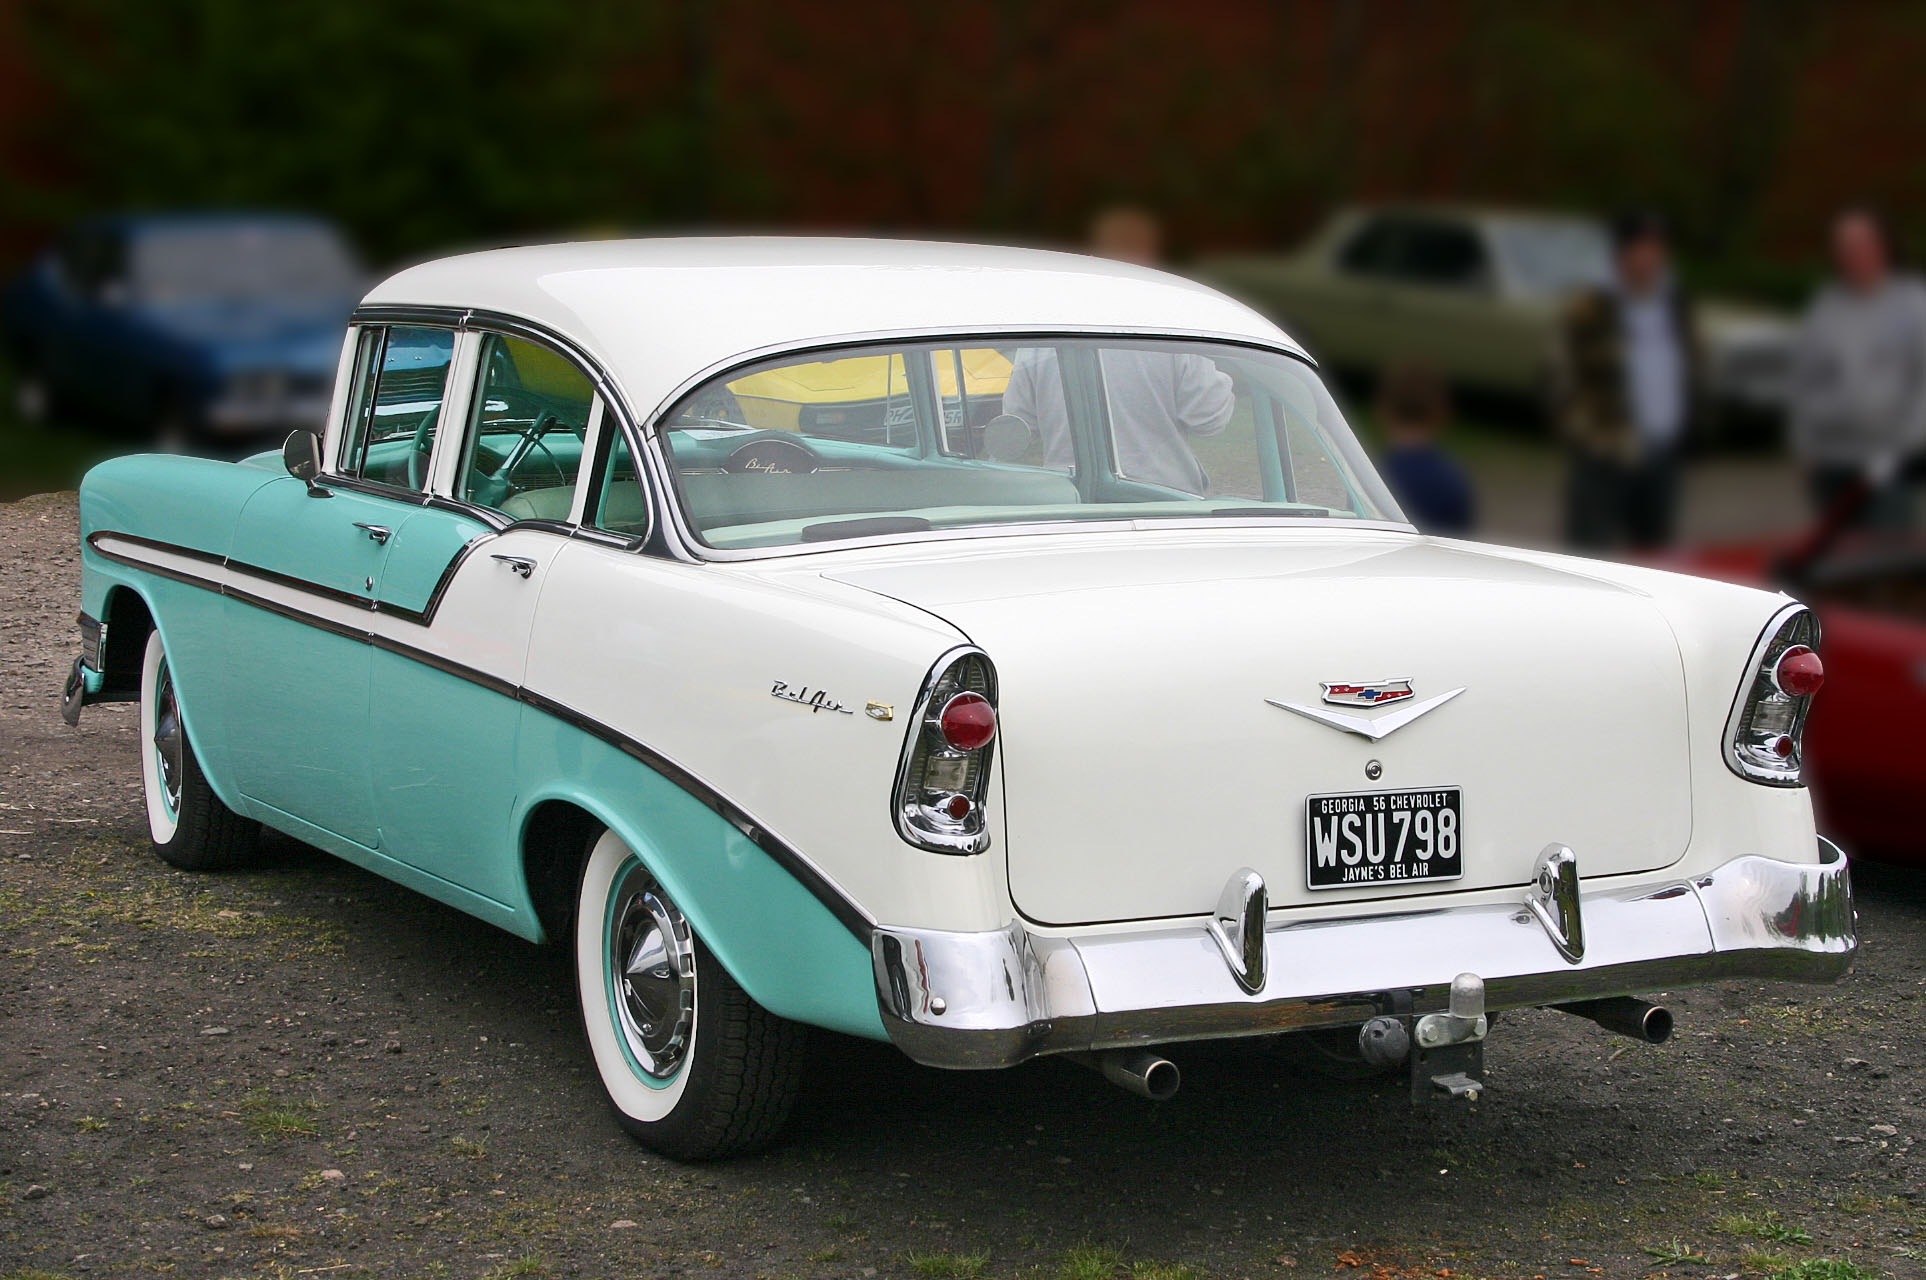 File Chevrolet Bel Air 1956 4door Sedan Rear Jpg Wikimedia